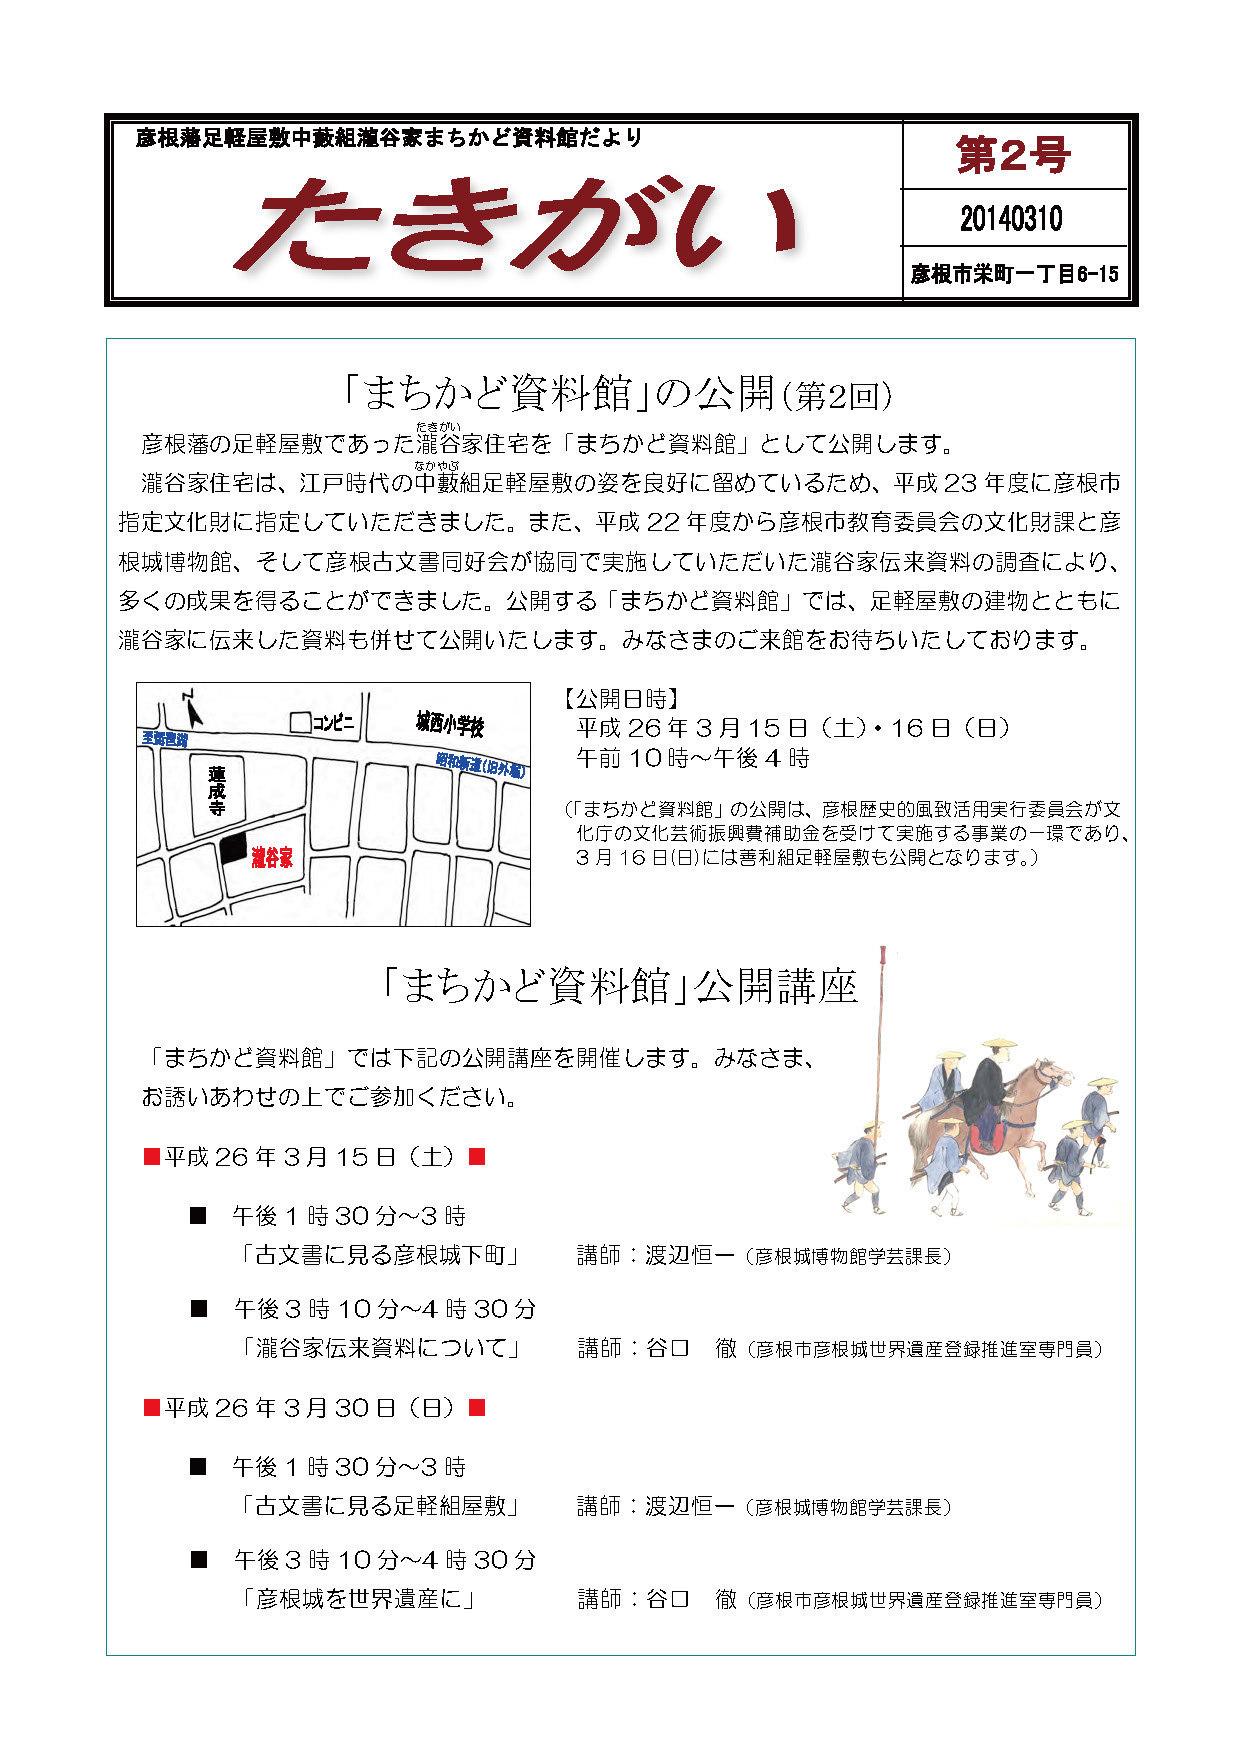 takigai02.jpg